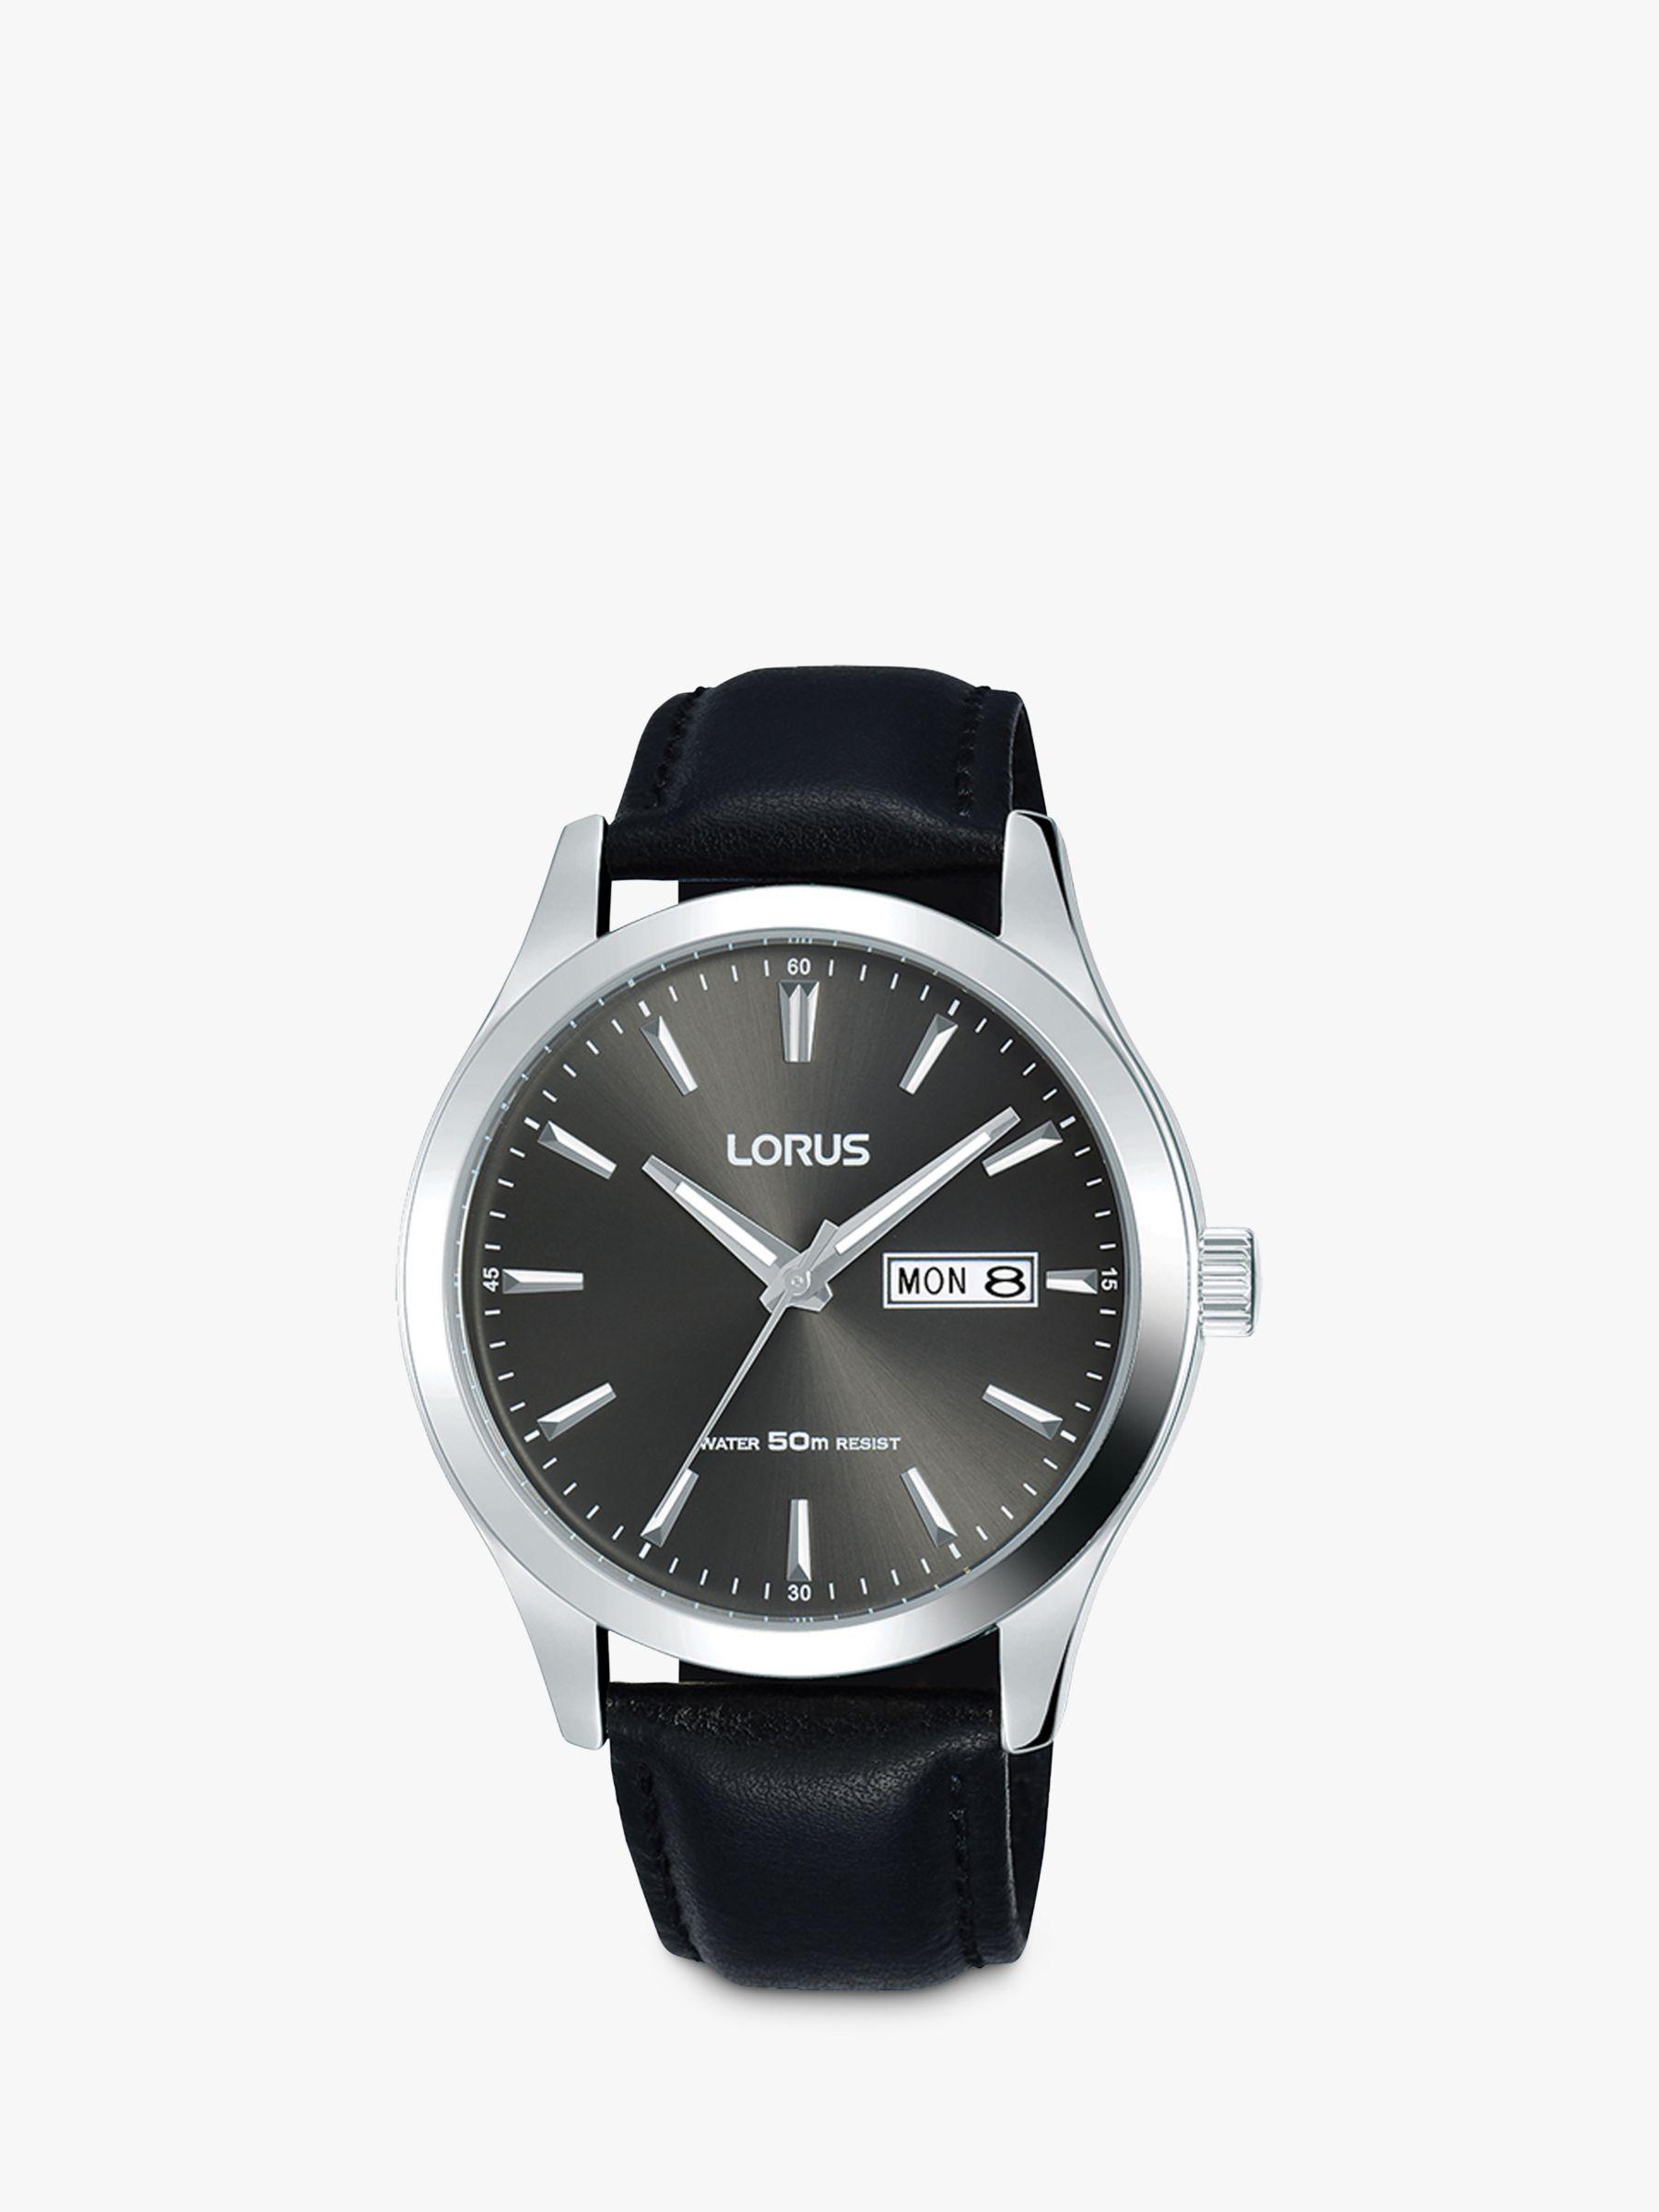 Lorus Lorus Men's Day Date Leather Strap Watch, Black/Grey RXN63DX9